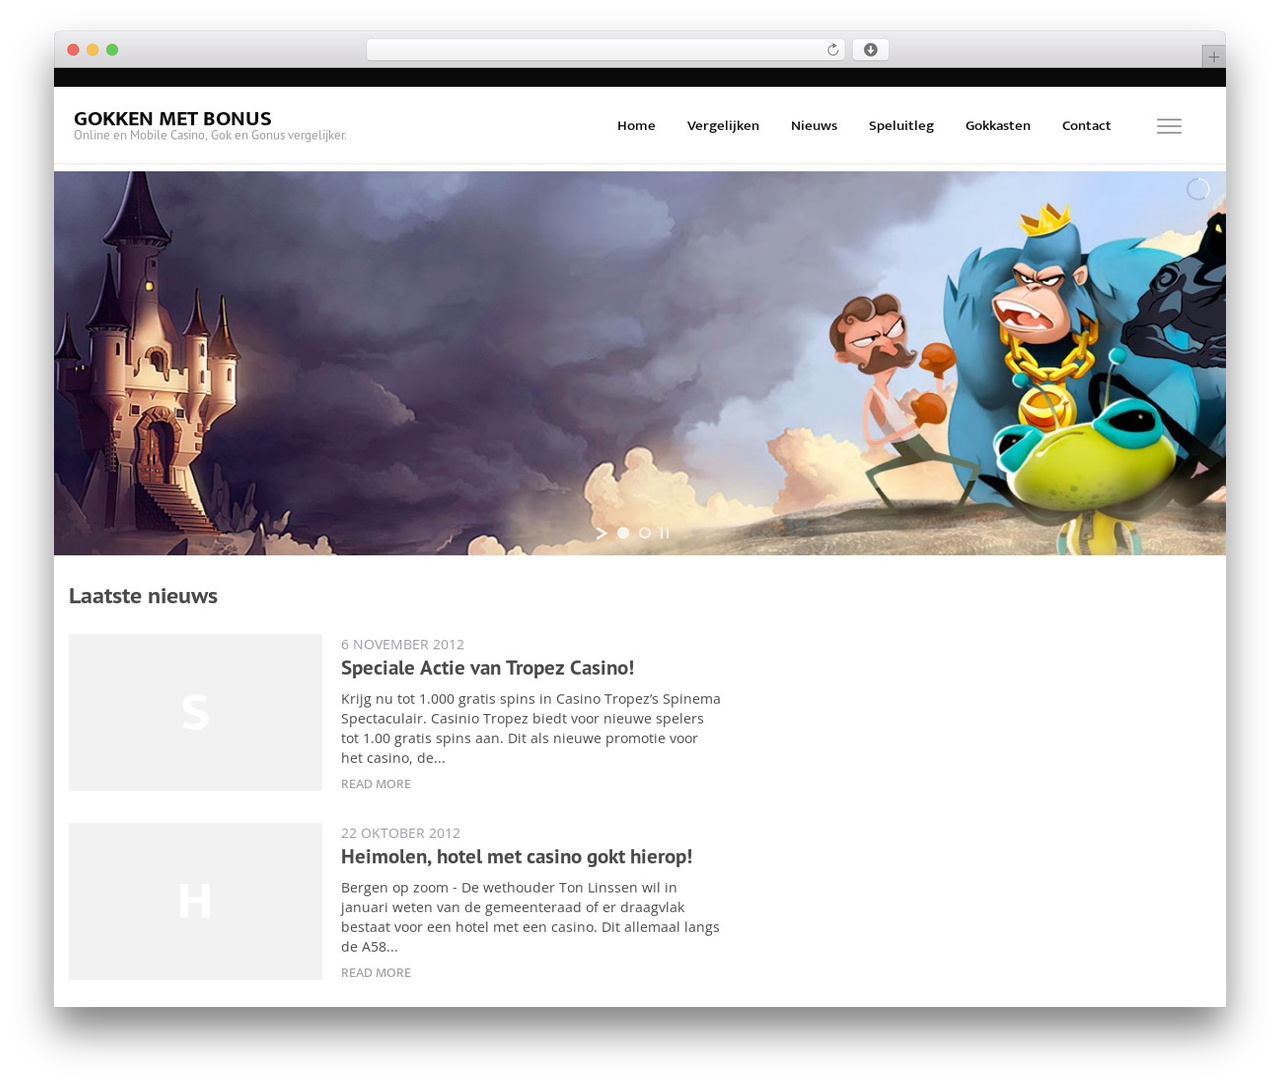 VegasHero Child Theme best WordPress theme - gokkenmetbonus.nl